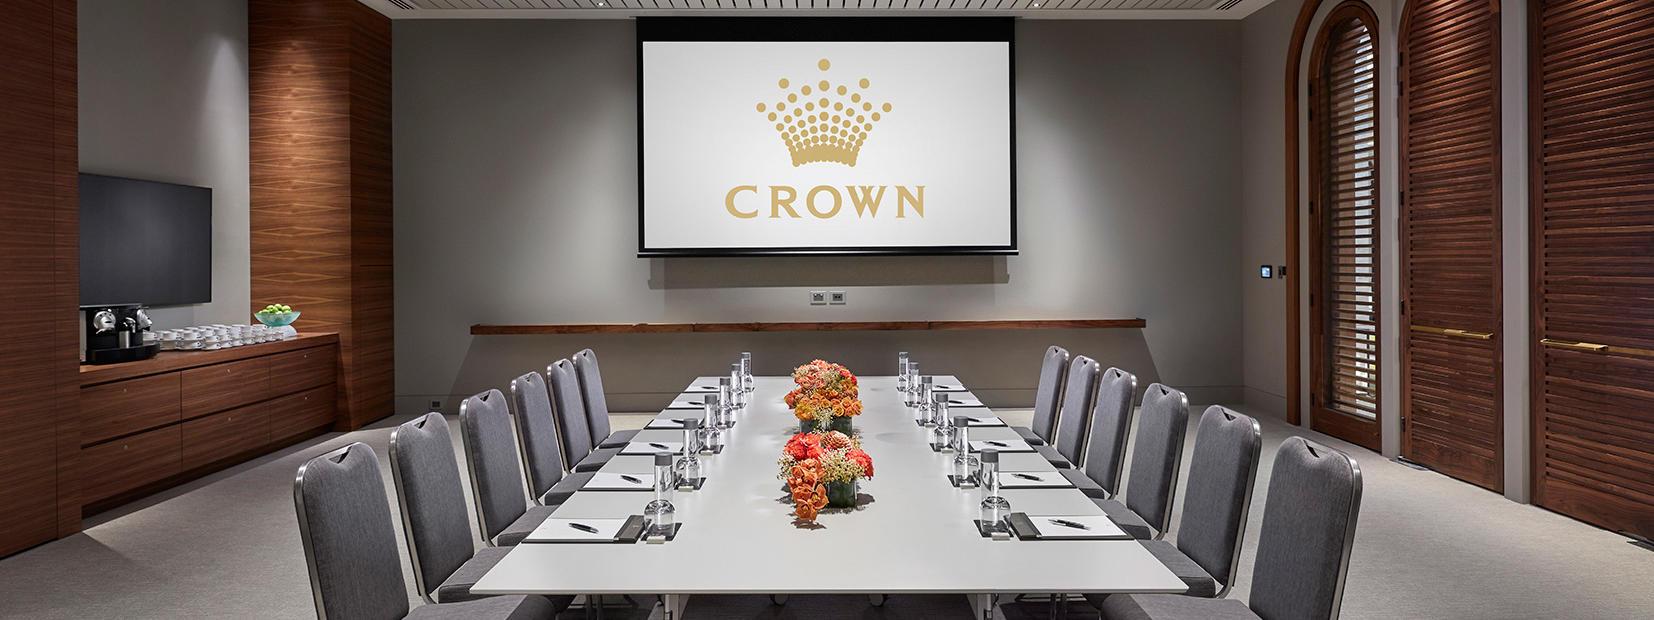 Crown Towers Meeting Rooms Meeting rooms at Crown Hotel Perth